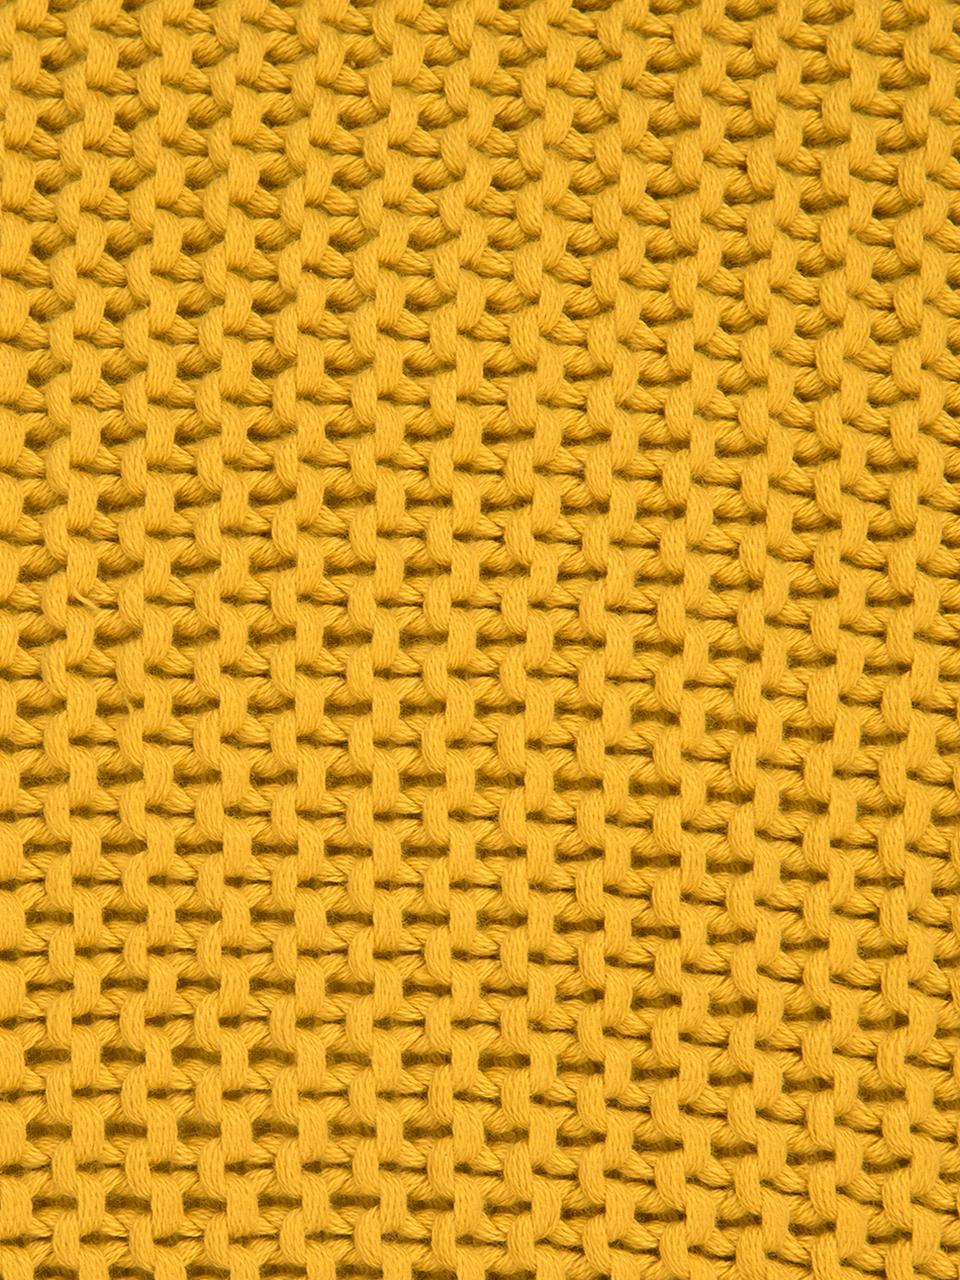 Strick-Kissenhülle Adalyn in Gelb, 100% Baumwolle, Ockergelb, 40 x 40 cm